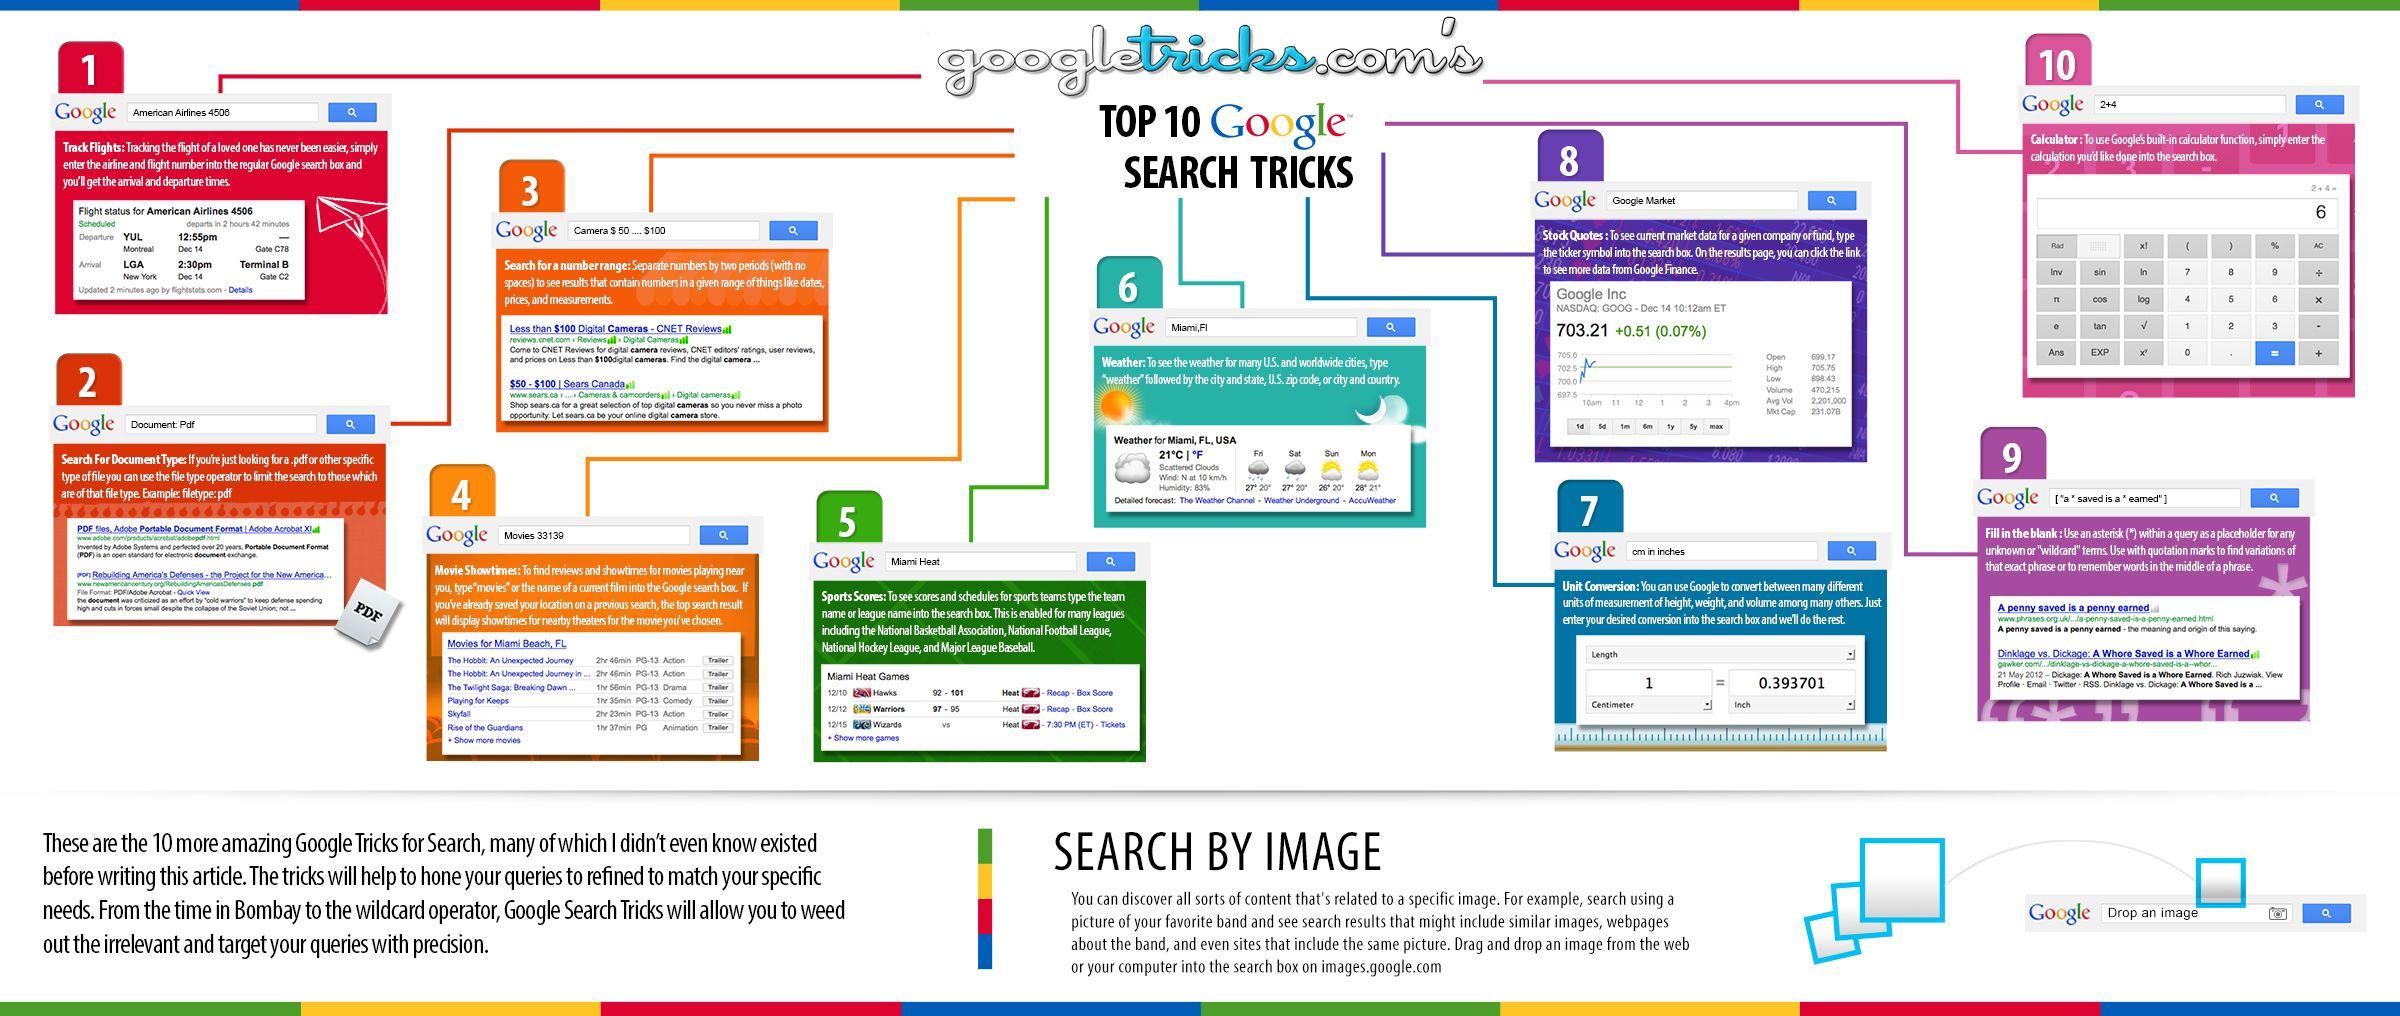 Www Ecommerce Org Il Top 10 Google Search Tricks Google